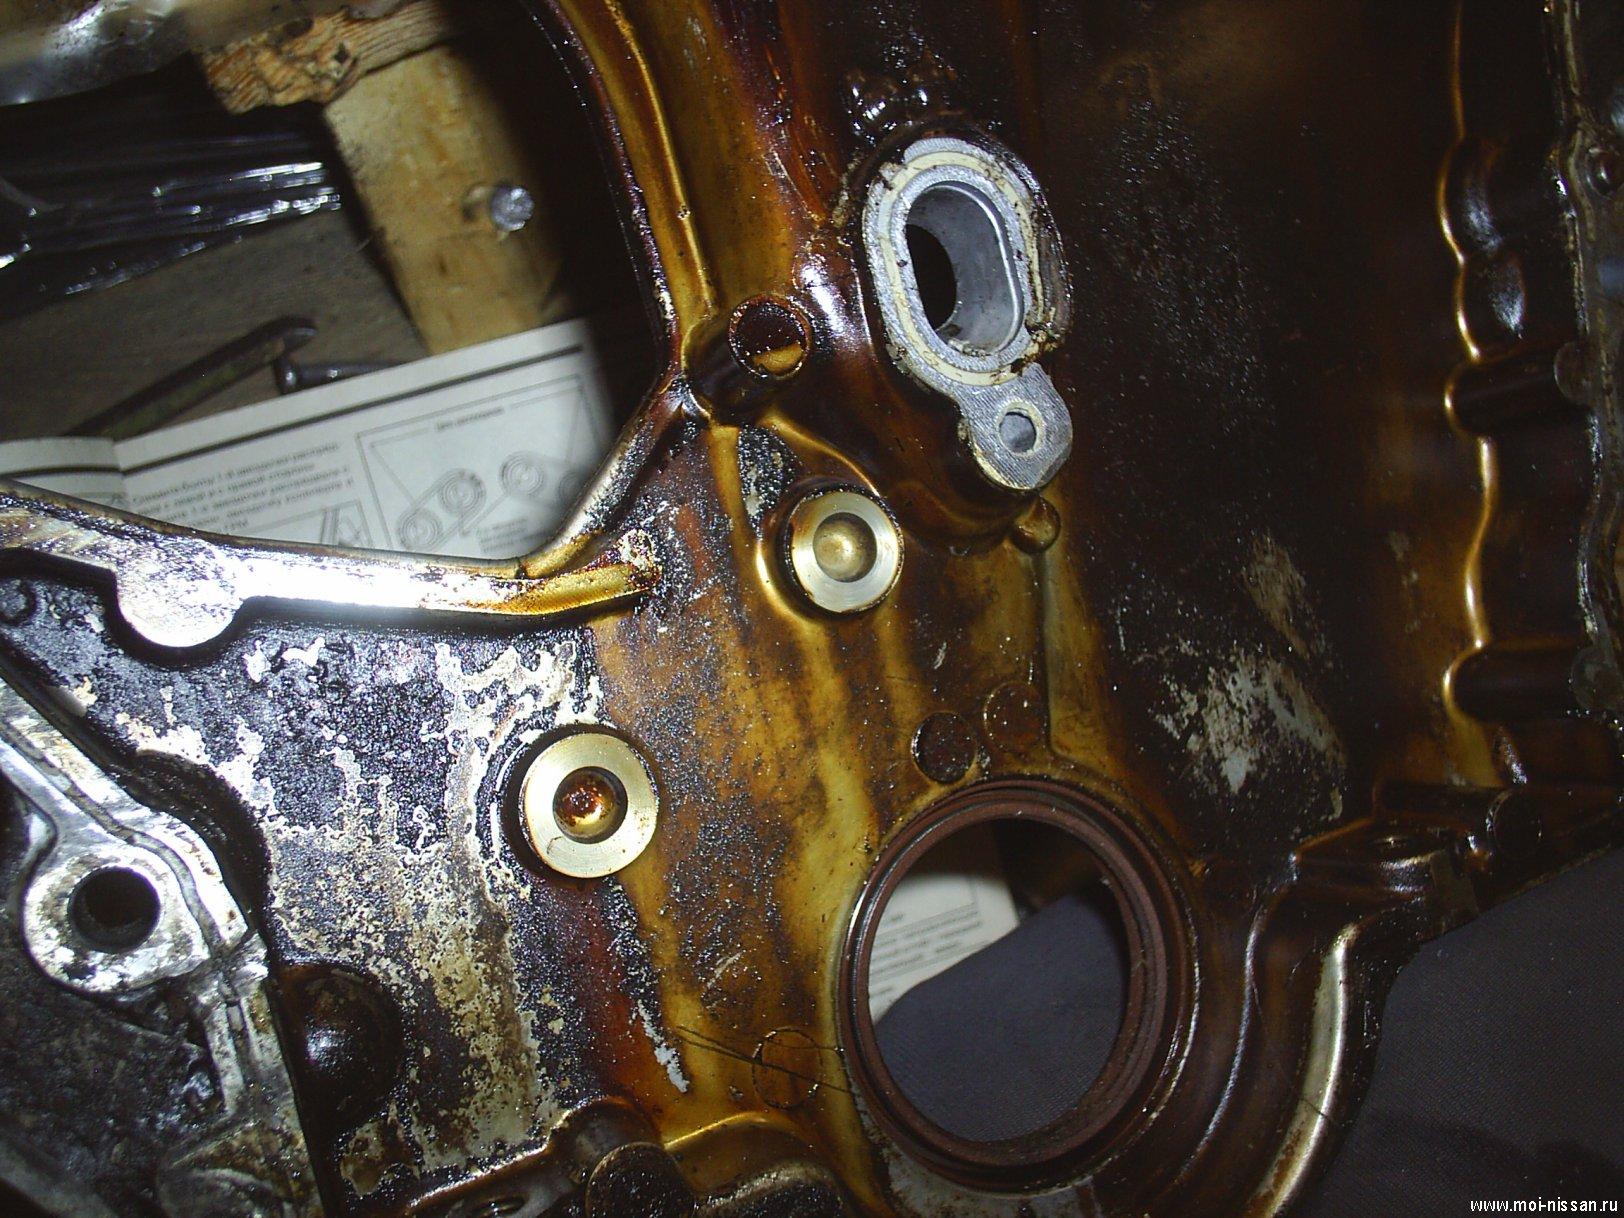 регулятор давления тормоза мазда626 1985г в схемах